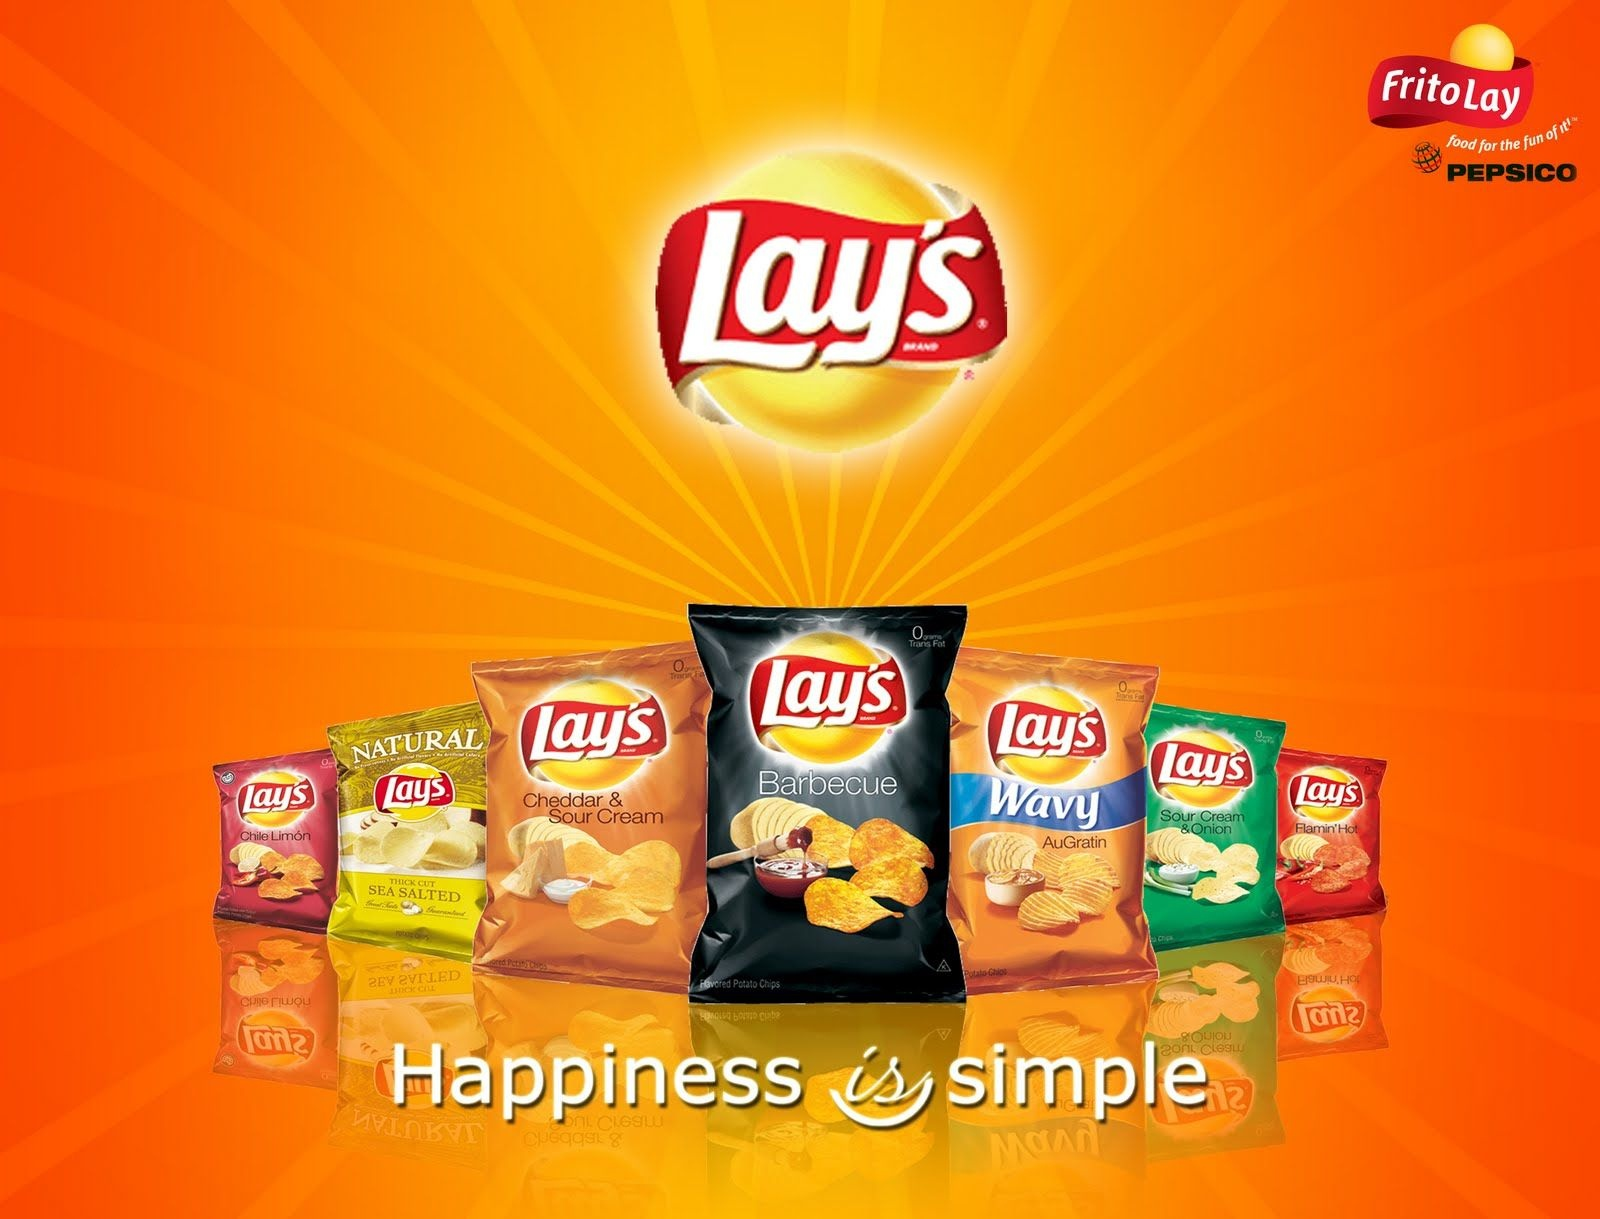 Patates #chips #food #potato #lays   Lay's Yurtdışı   Potato Chips - Free Printable Frito Lay Coupons